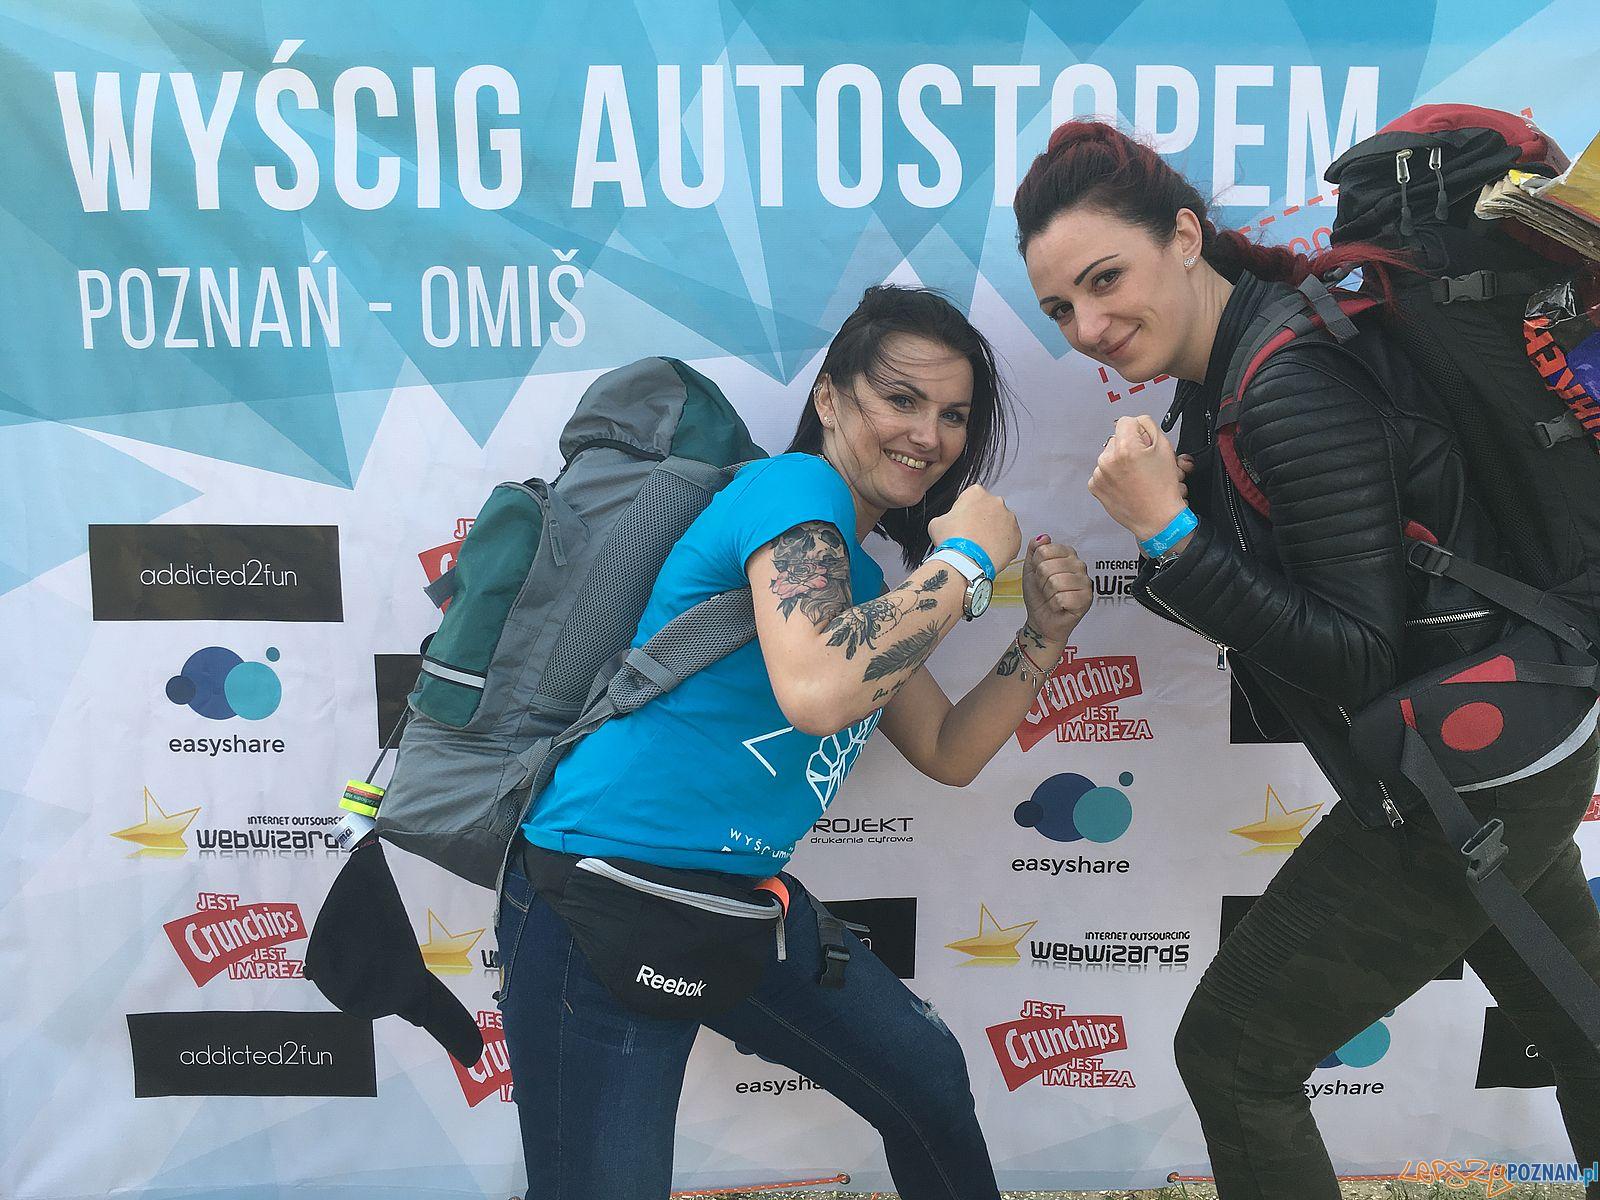 Autostop - zwycięski team  Foto: addicted2fun